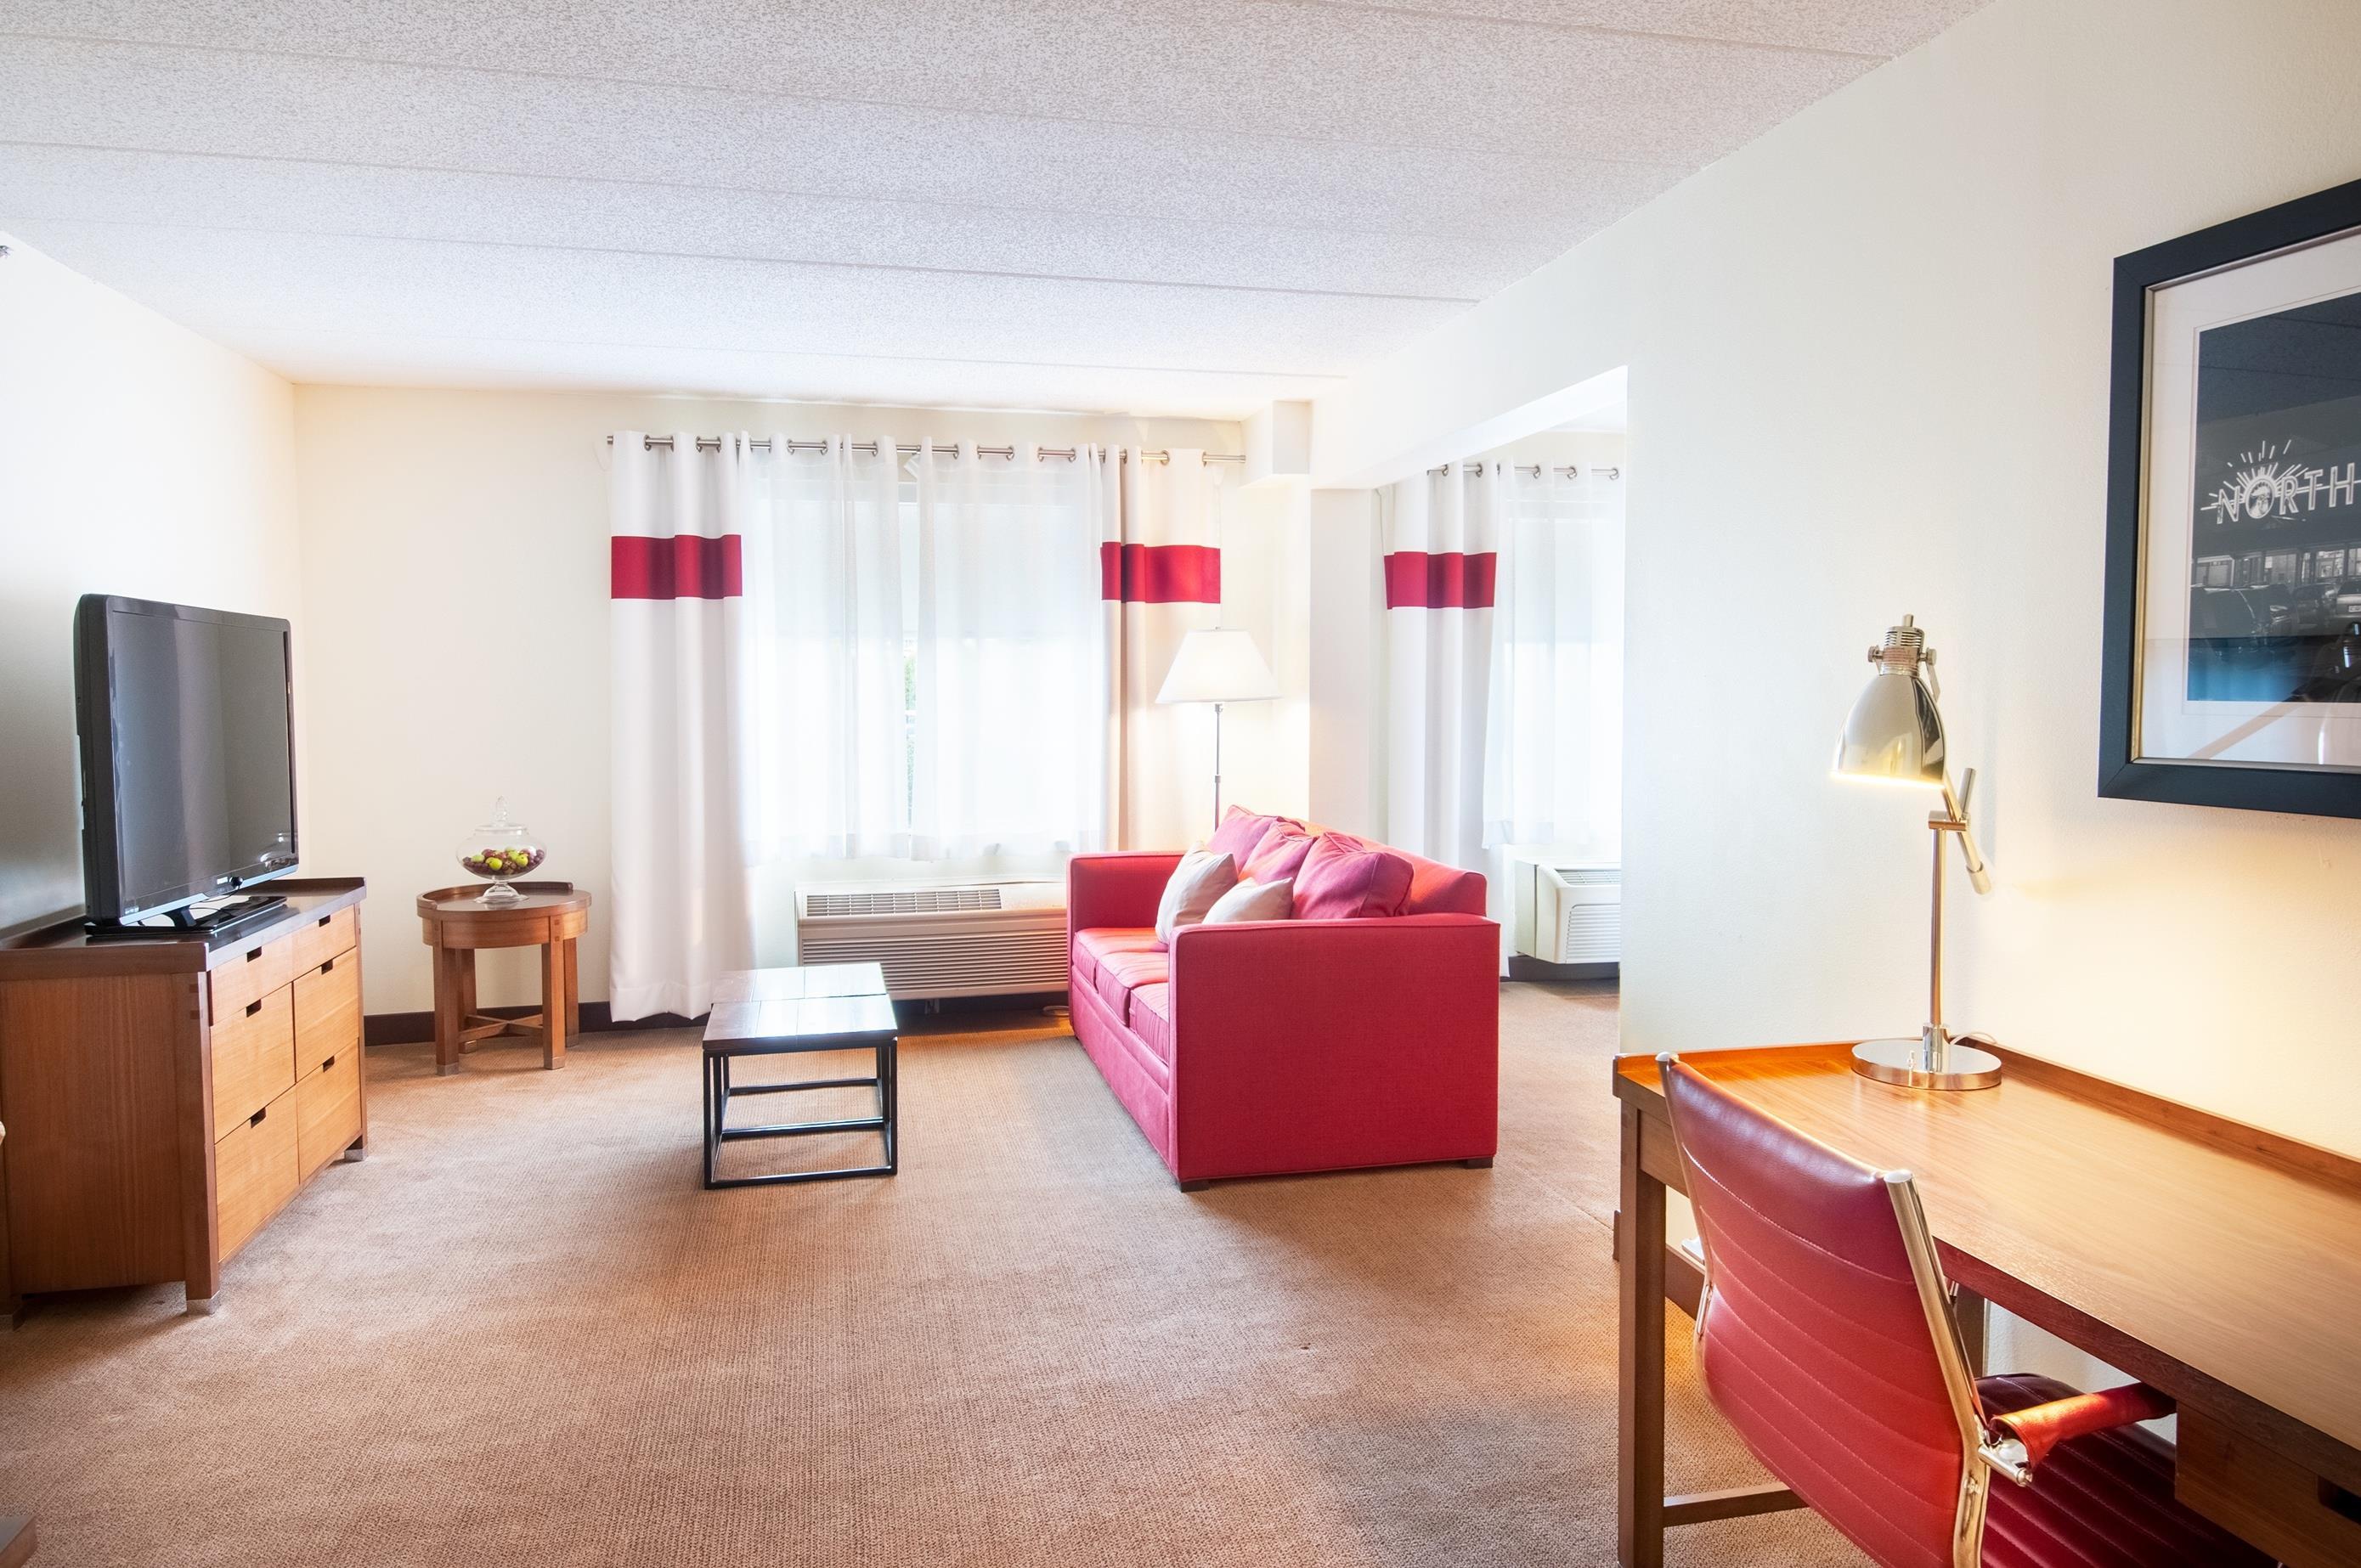 Hotels Near Polaris Fashion Place - Hampton Inn Polaris